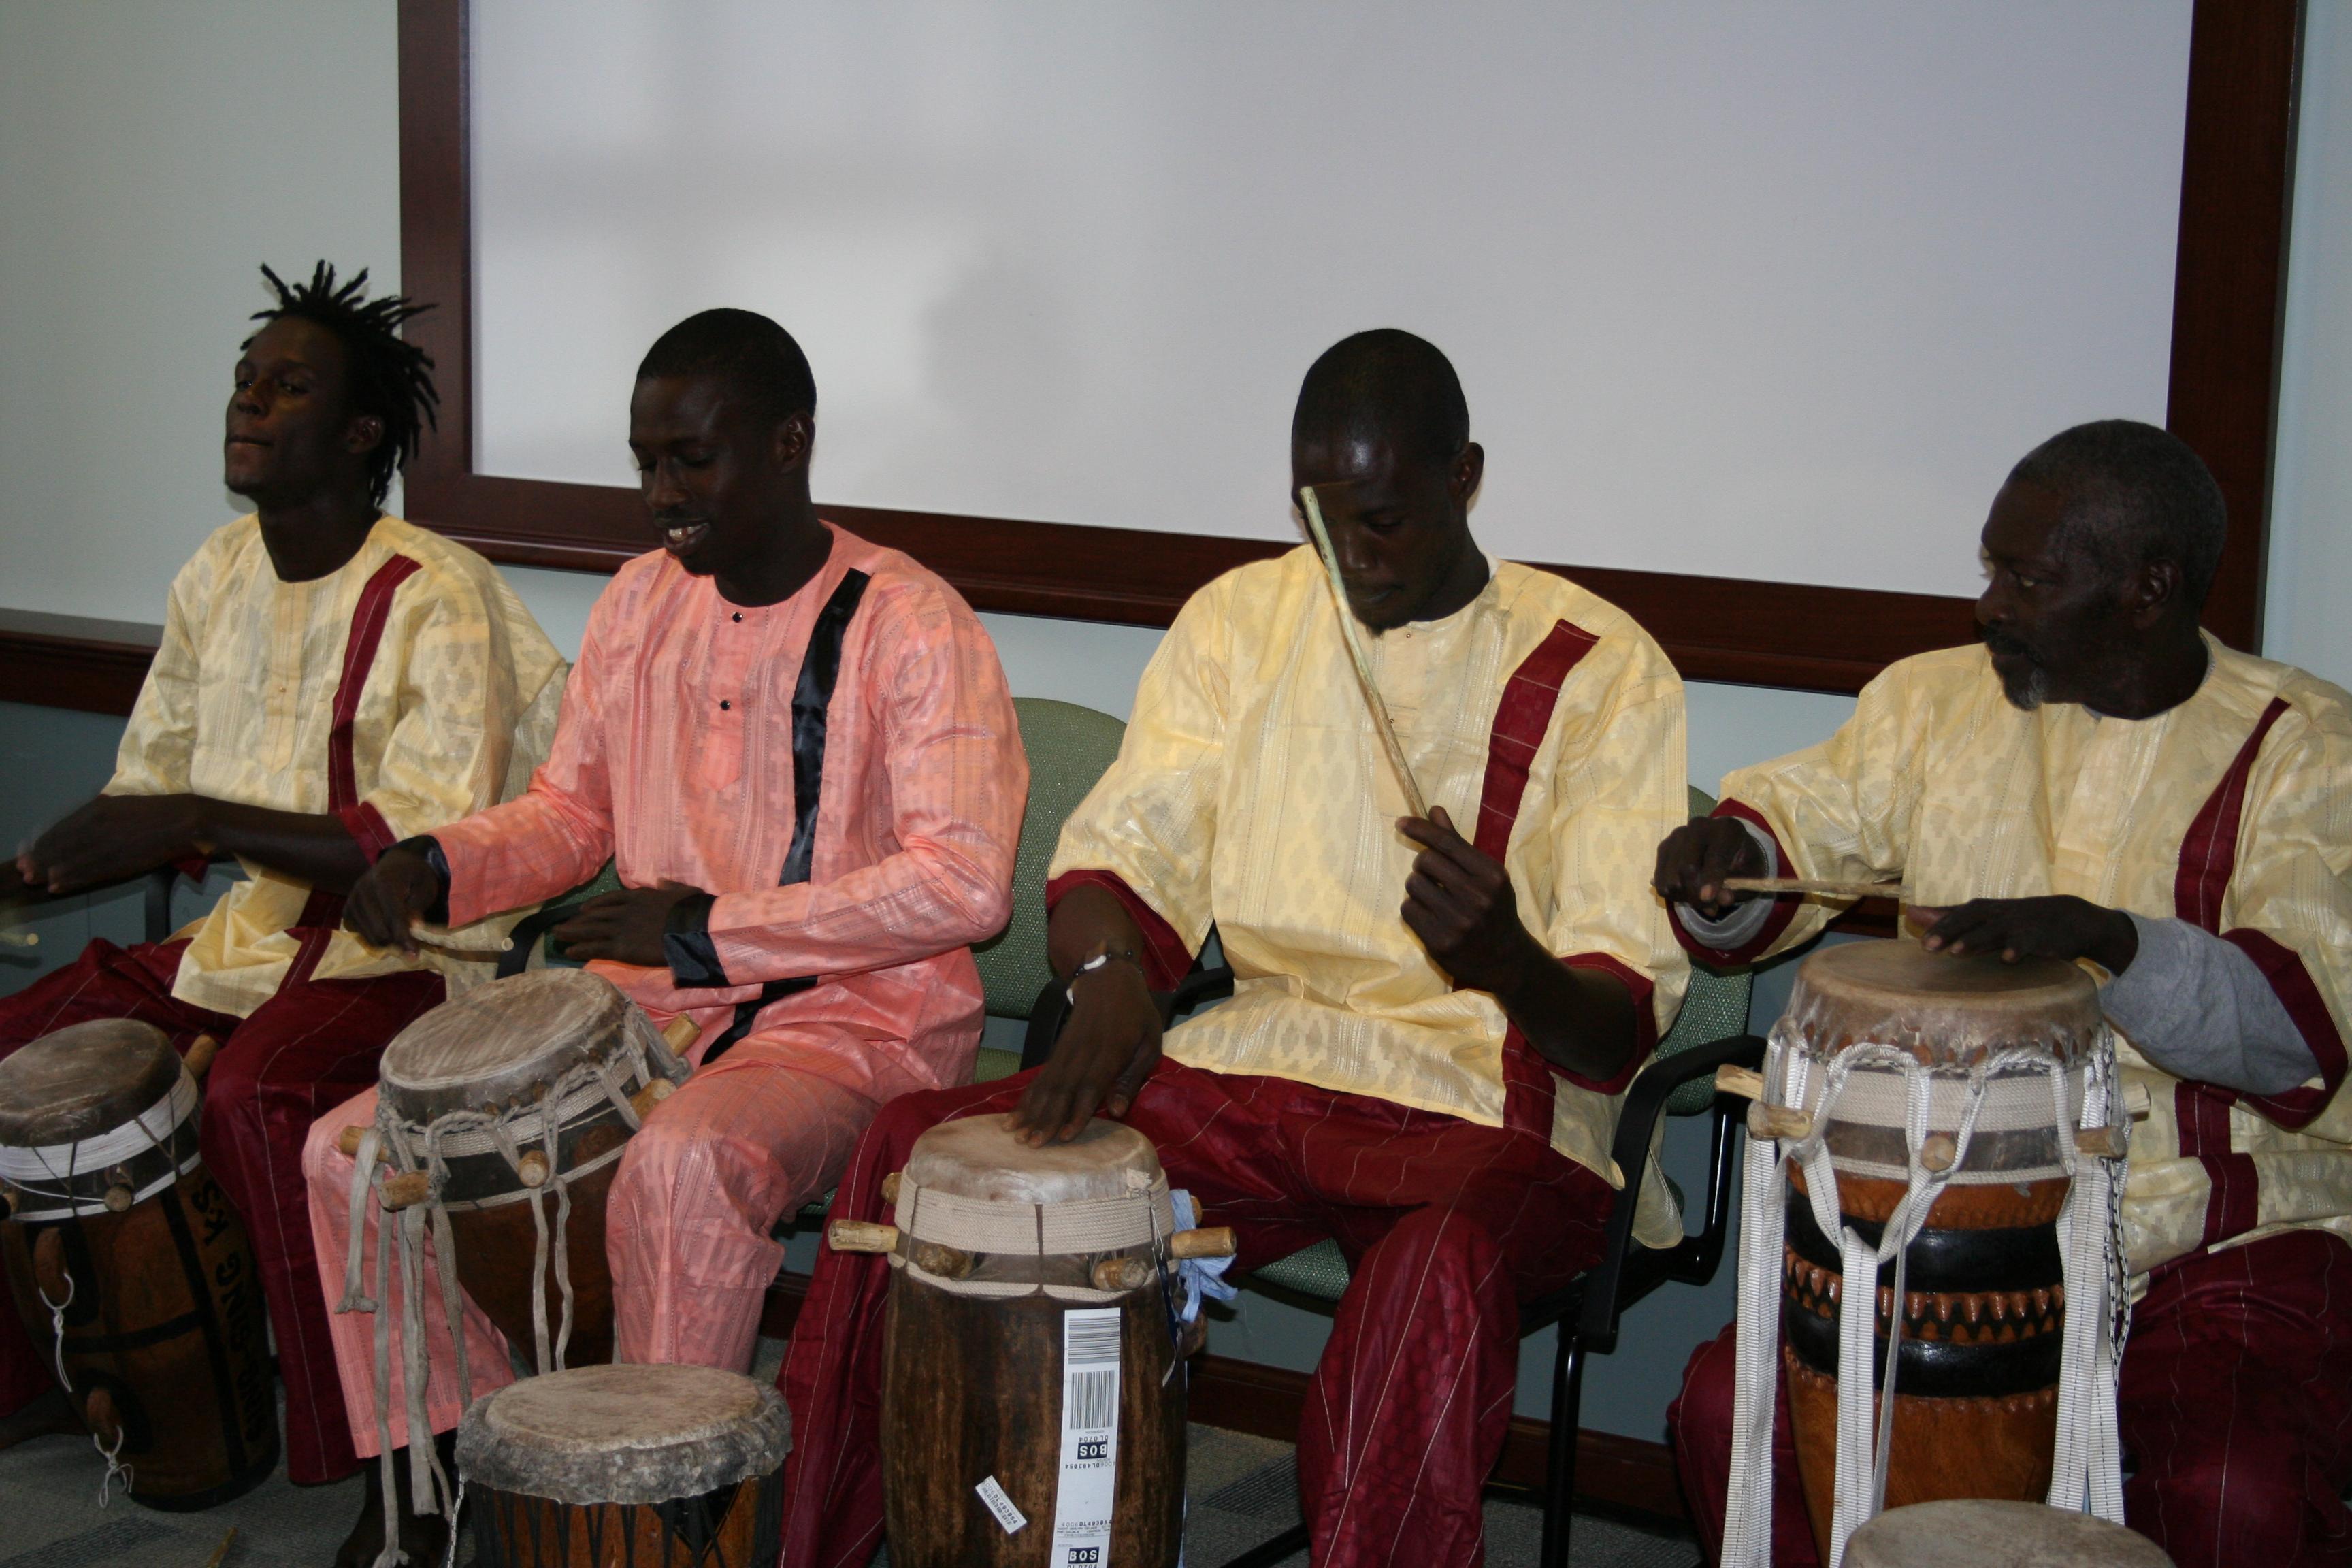 Presentation of sabar technique at Suffolk